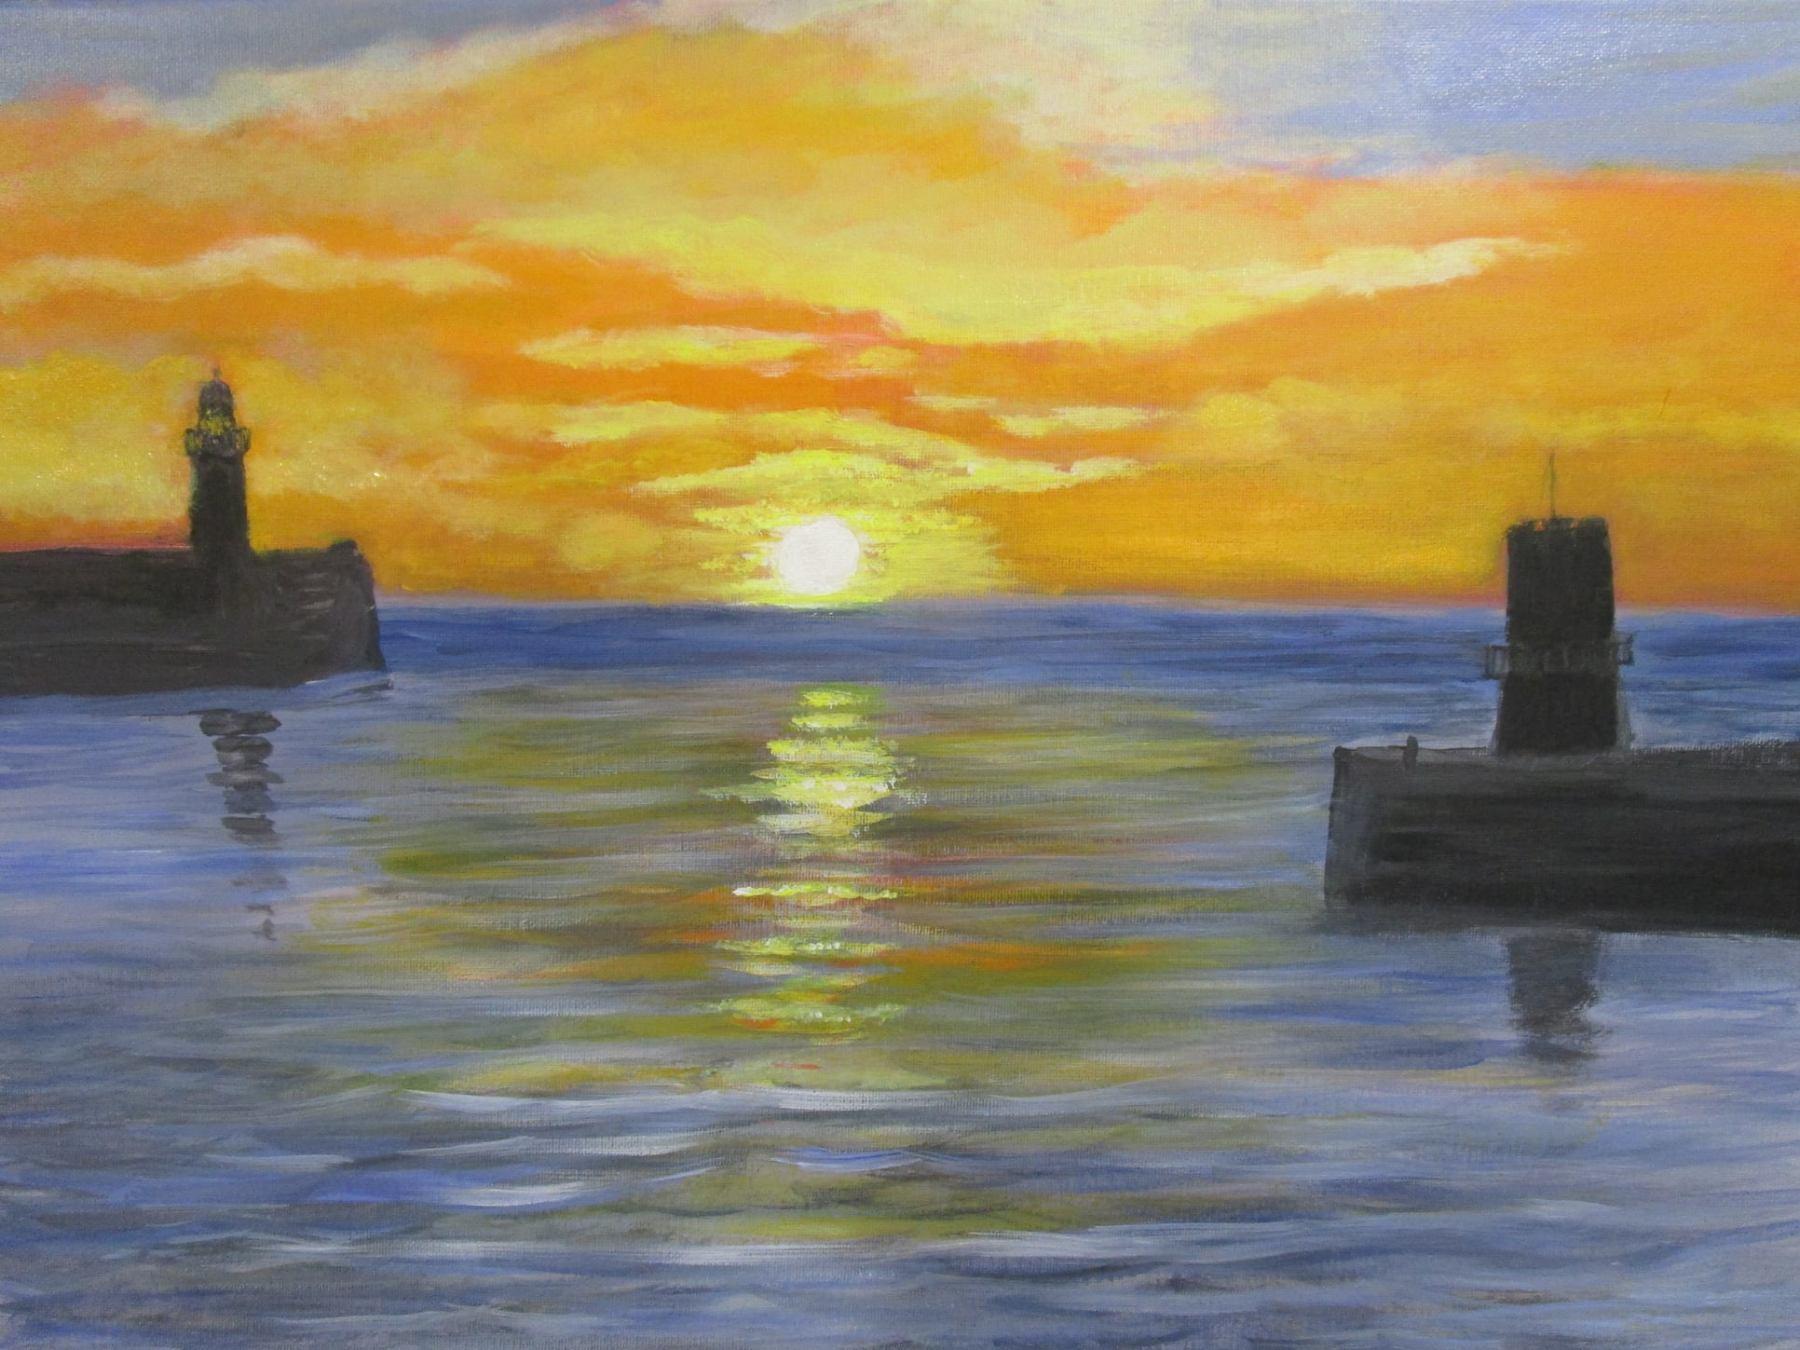 Acrylic painting of Whitehaven harbour entrance, Whitehaven, Cumbria, Northwest England - Tom Higgins